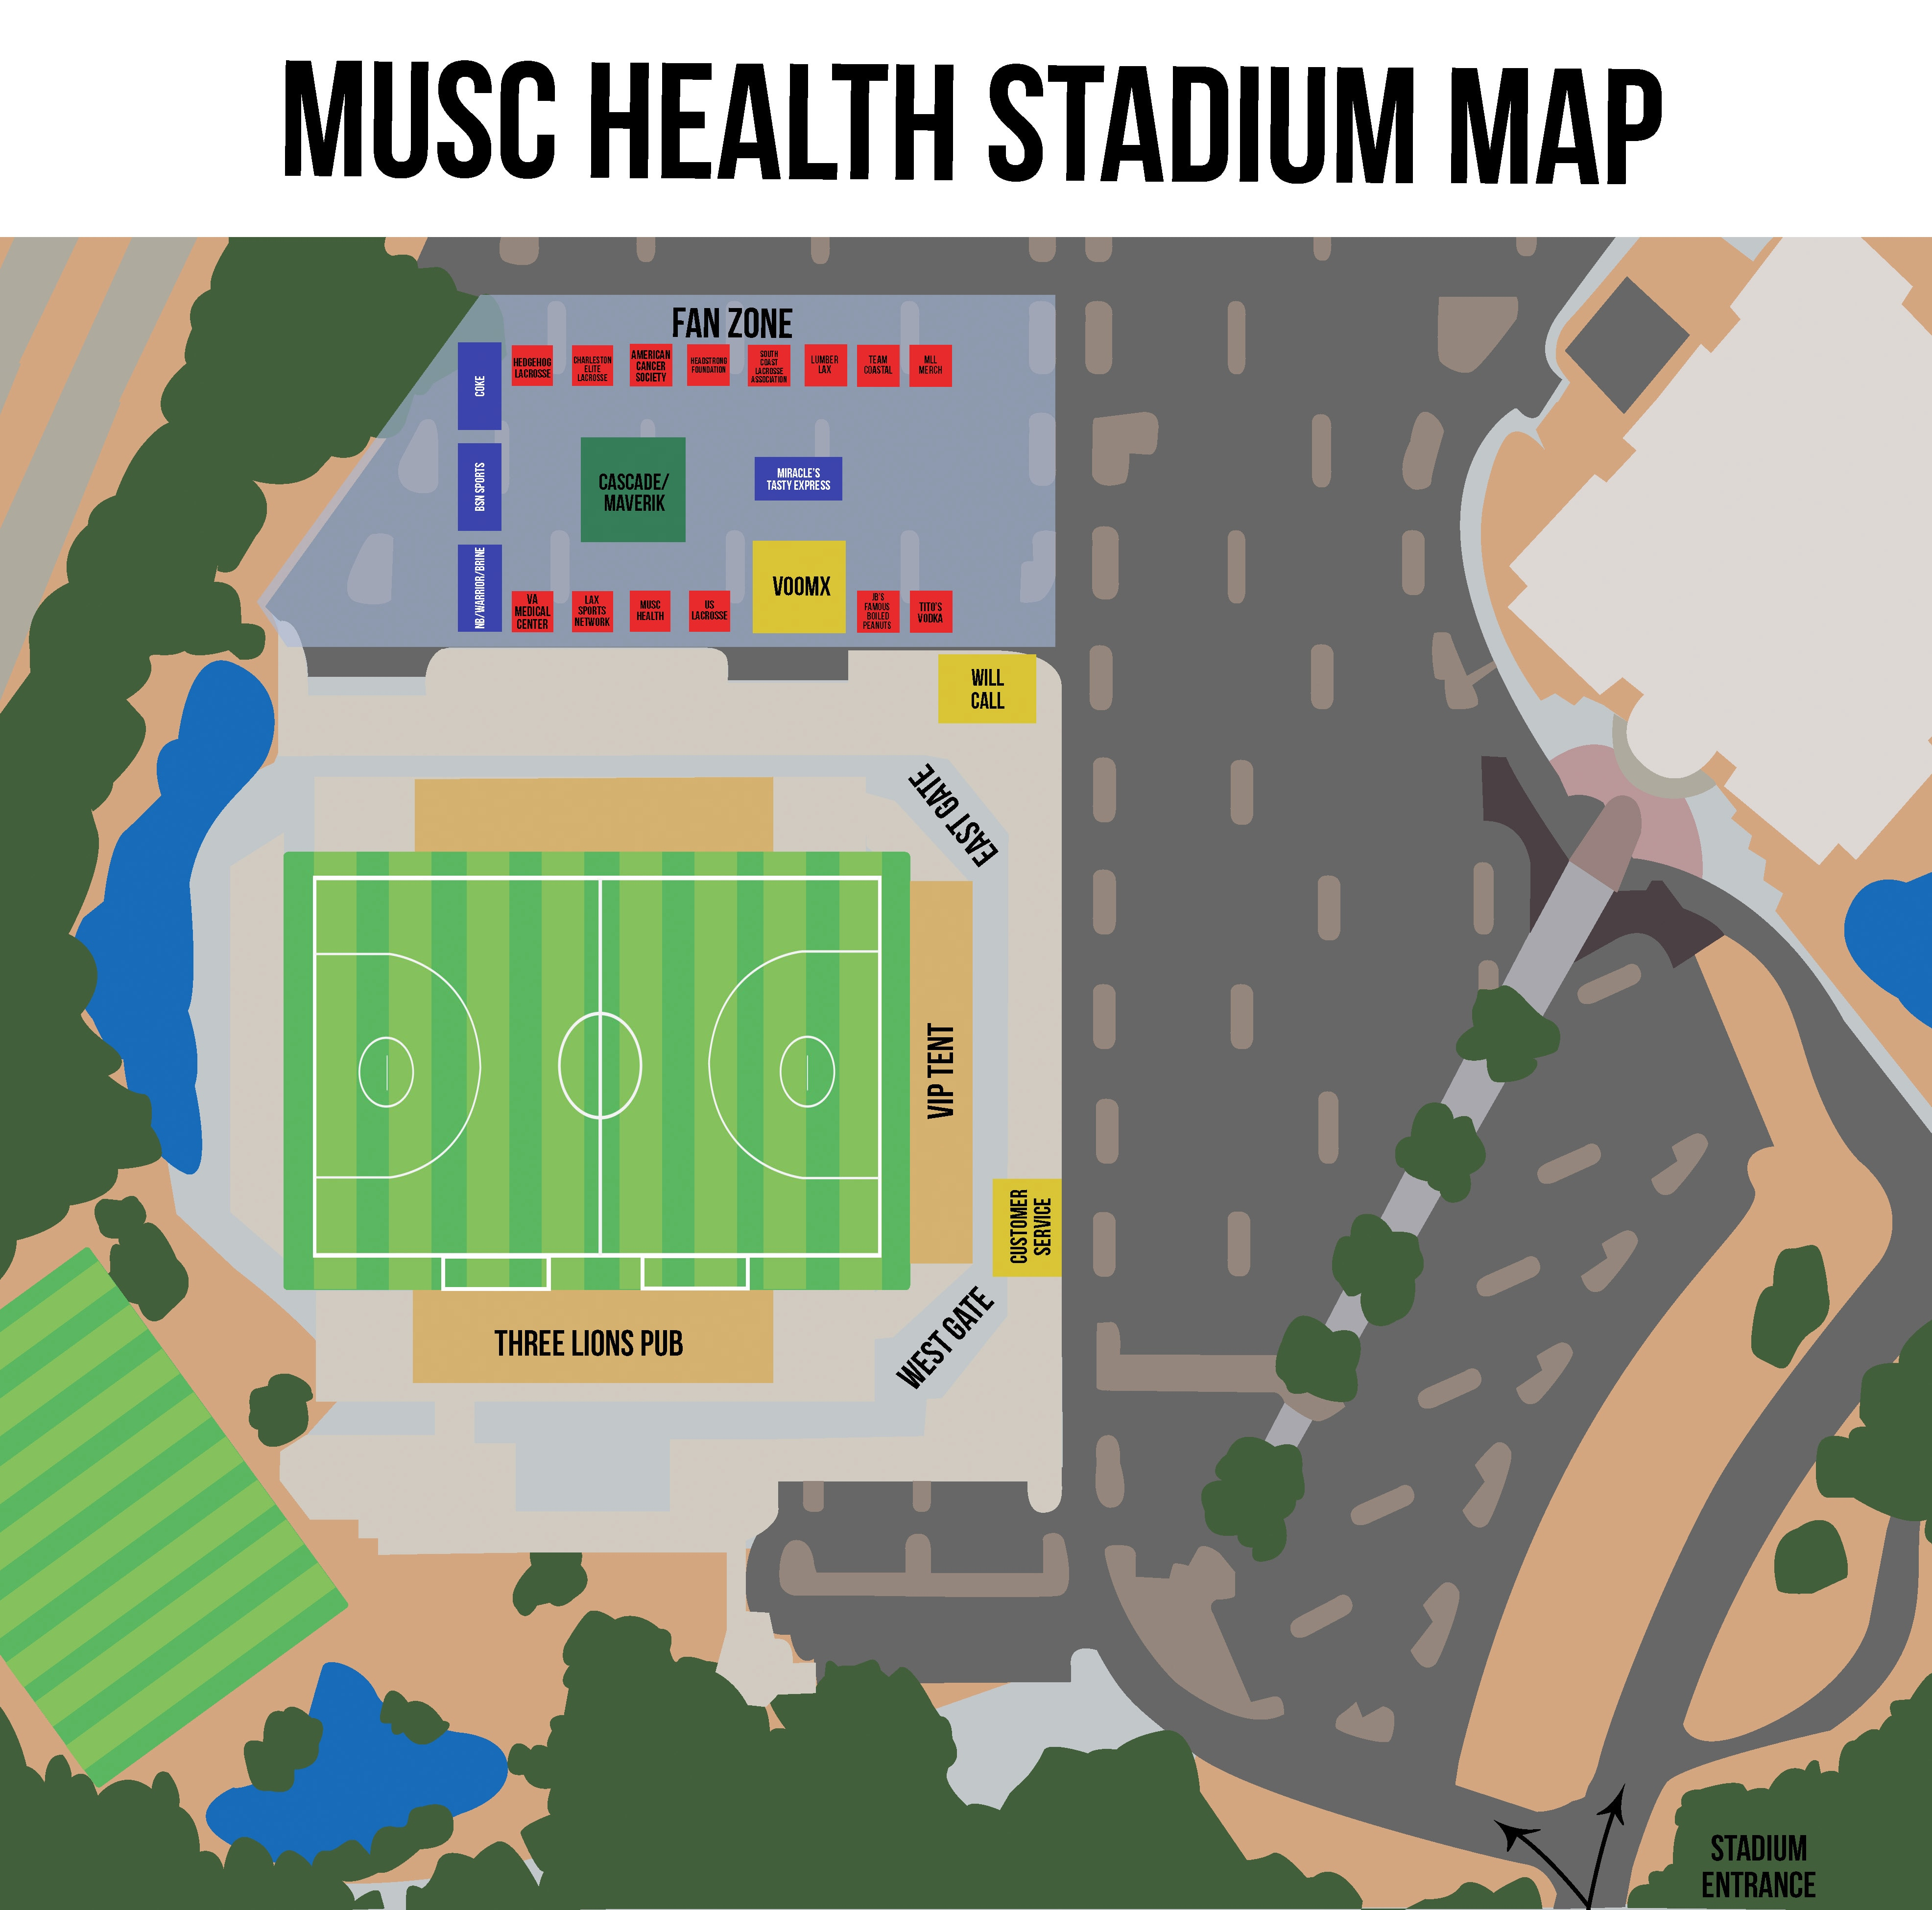 MUSC Health Stadium Map